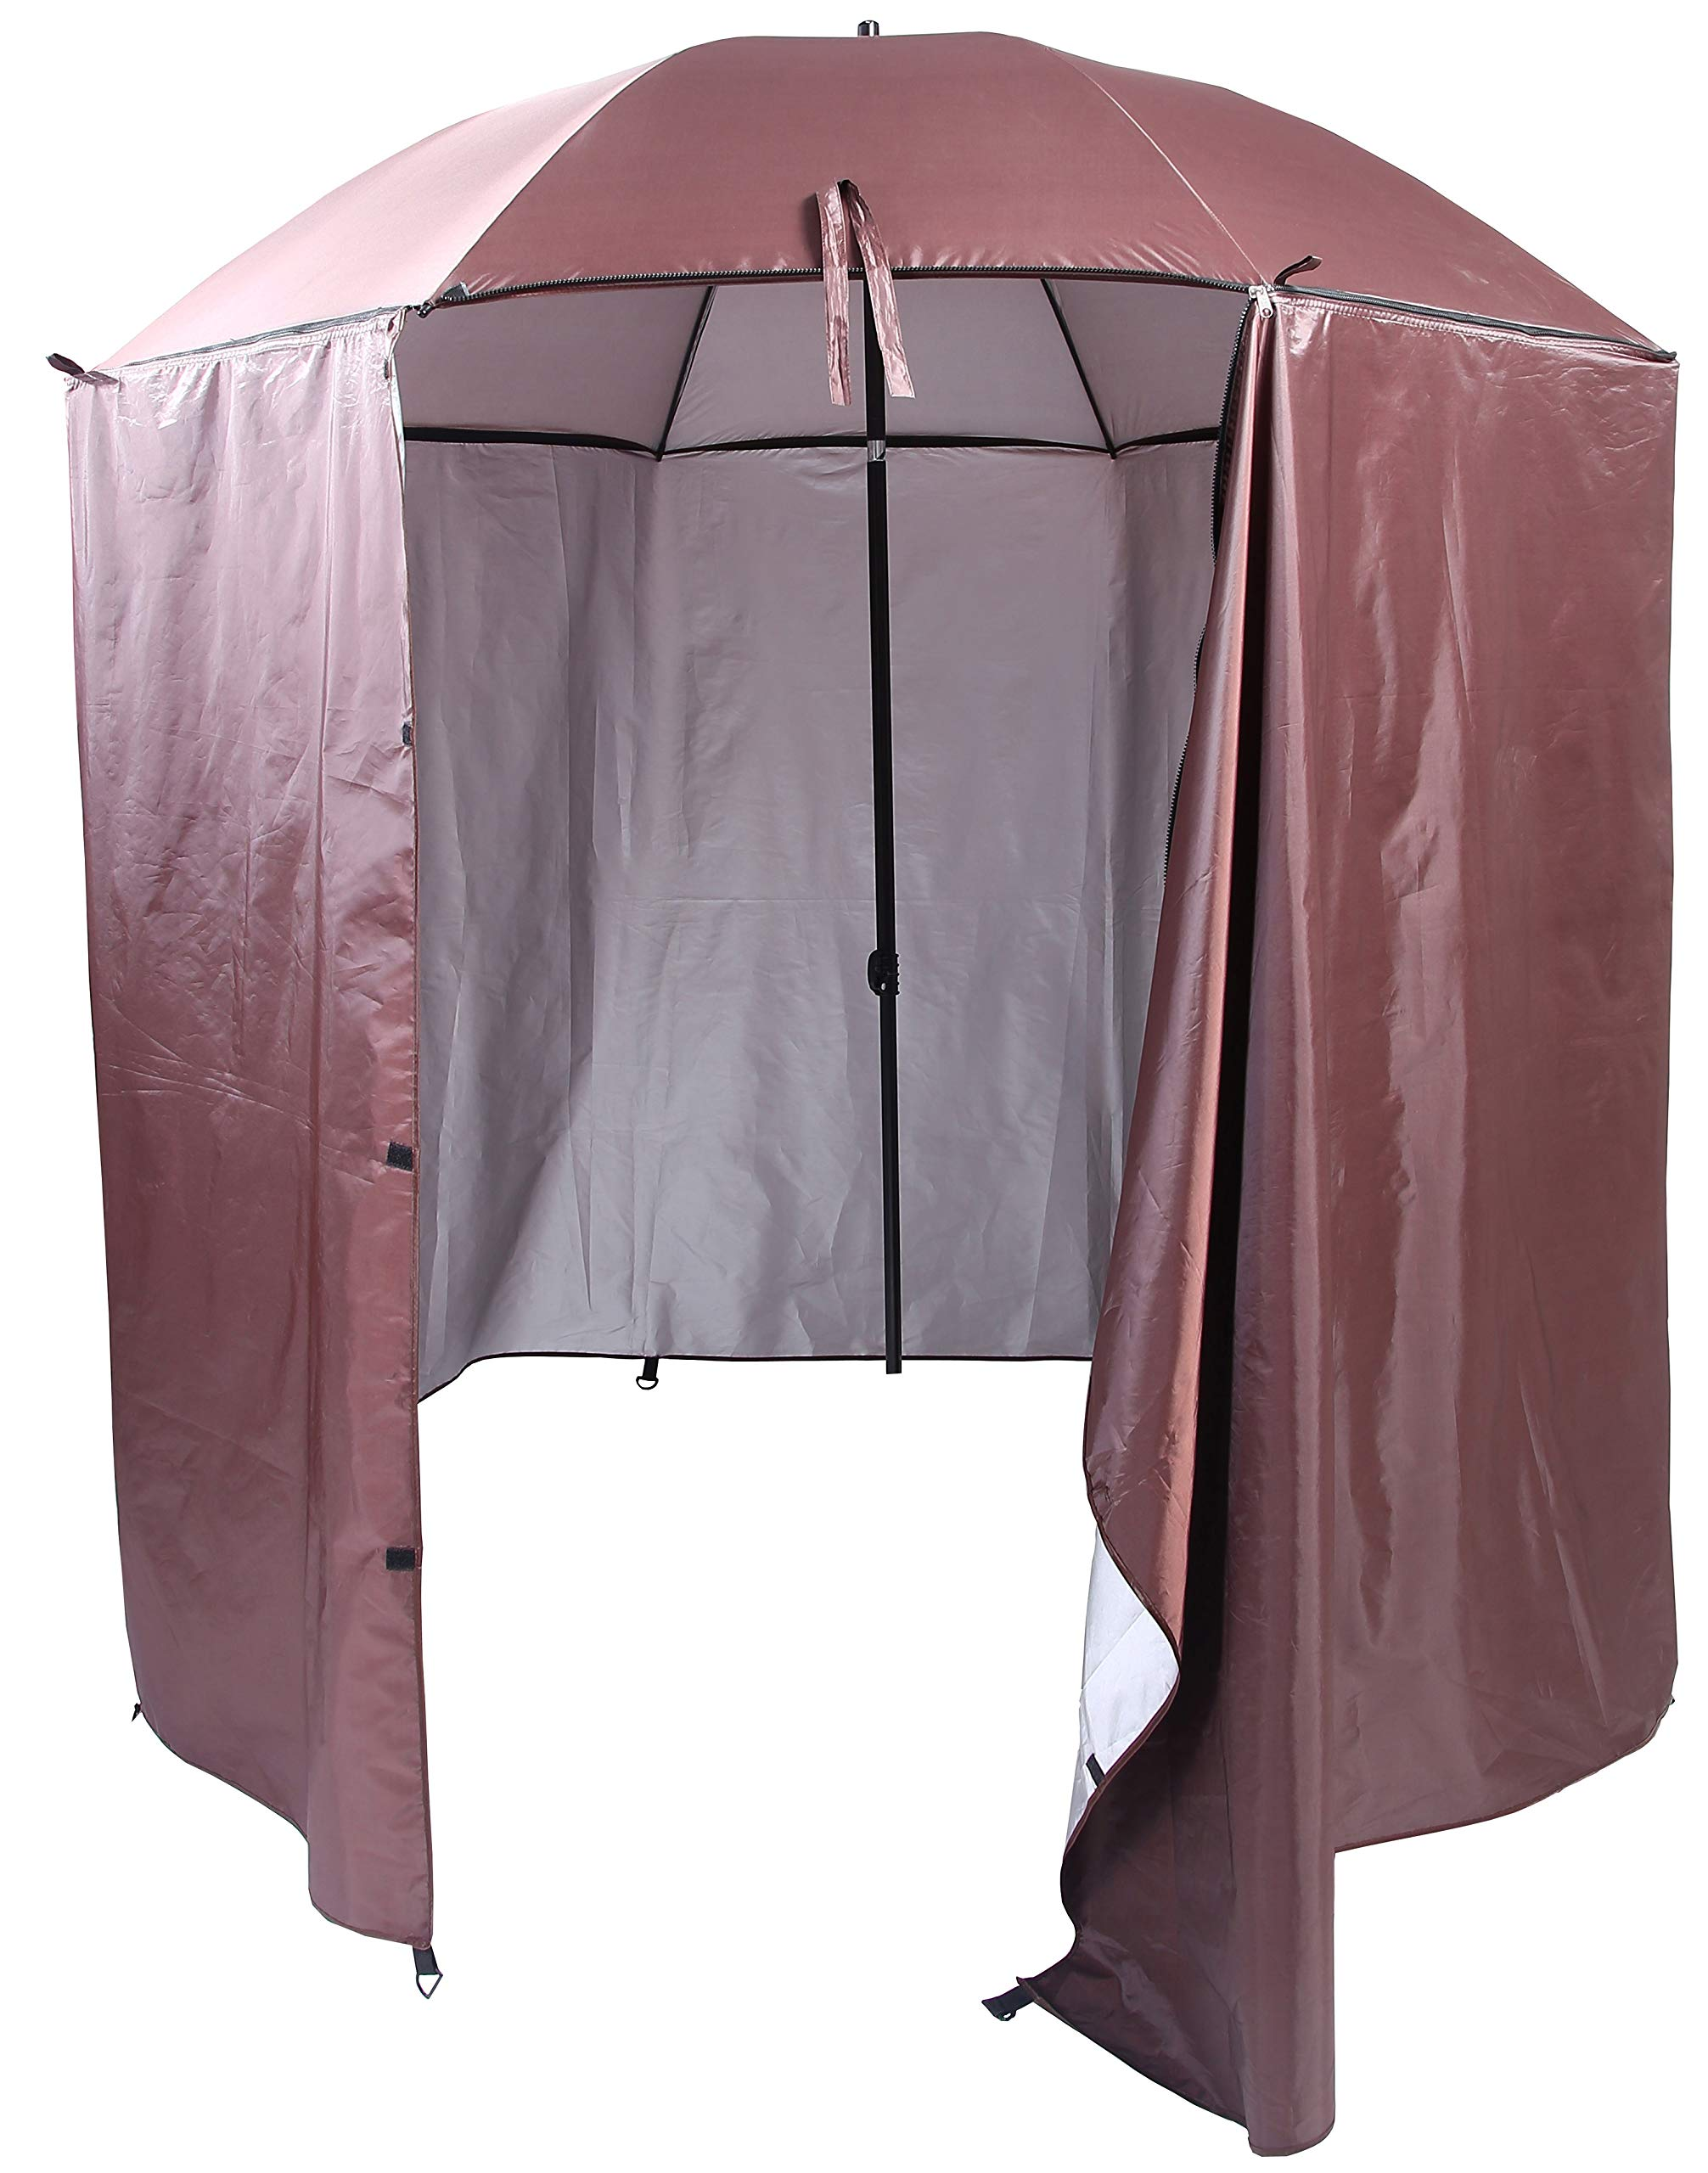 DDYOUTDOOR Portable Waterproof Camping Beach Fishing Picnic Shade Tent Canopy Umbrella Sunshade Cabana Sun Shelter (Coffee) by DDYOUTDOOR